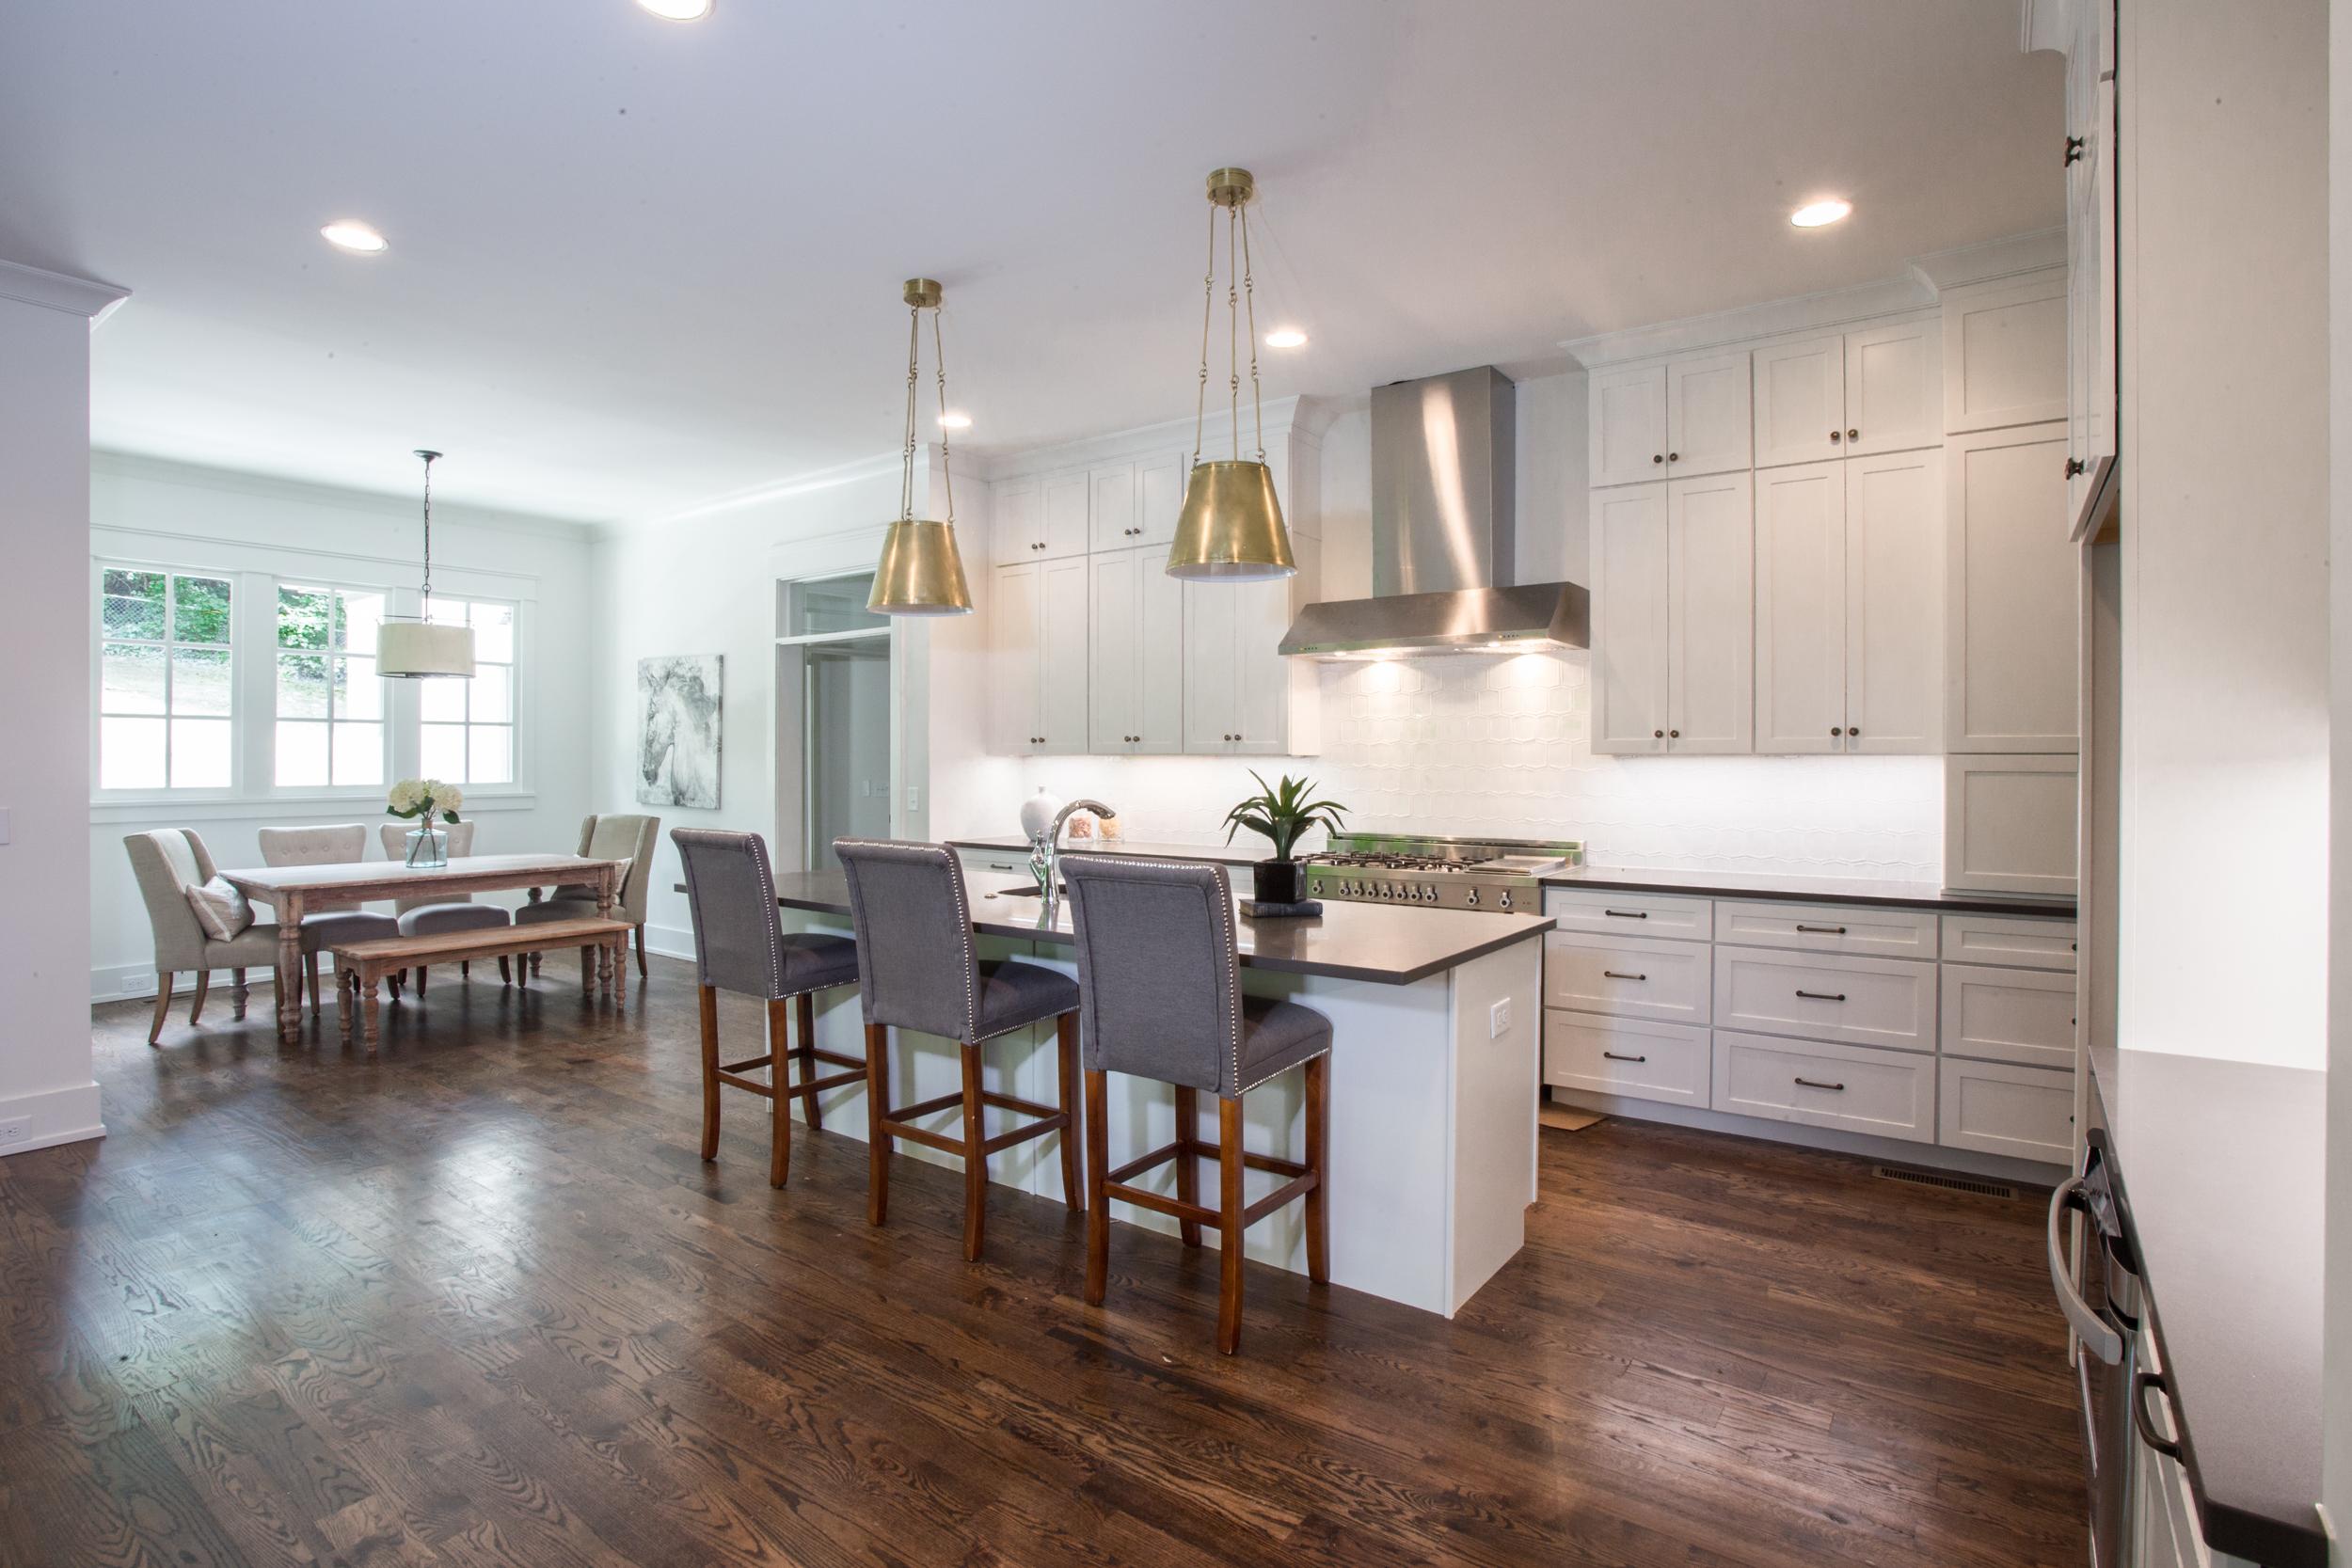 new-construction-nashville-custom-built-home-britt-development-group-7860.jpg